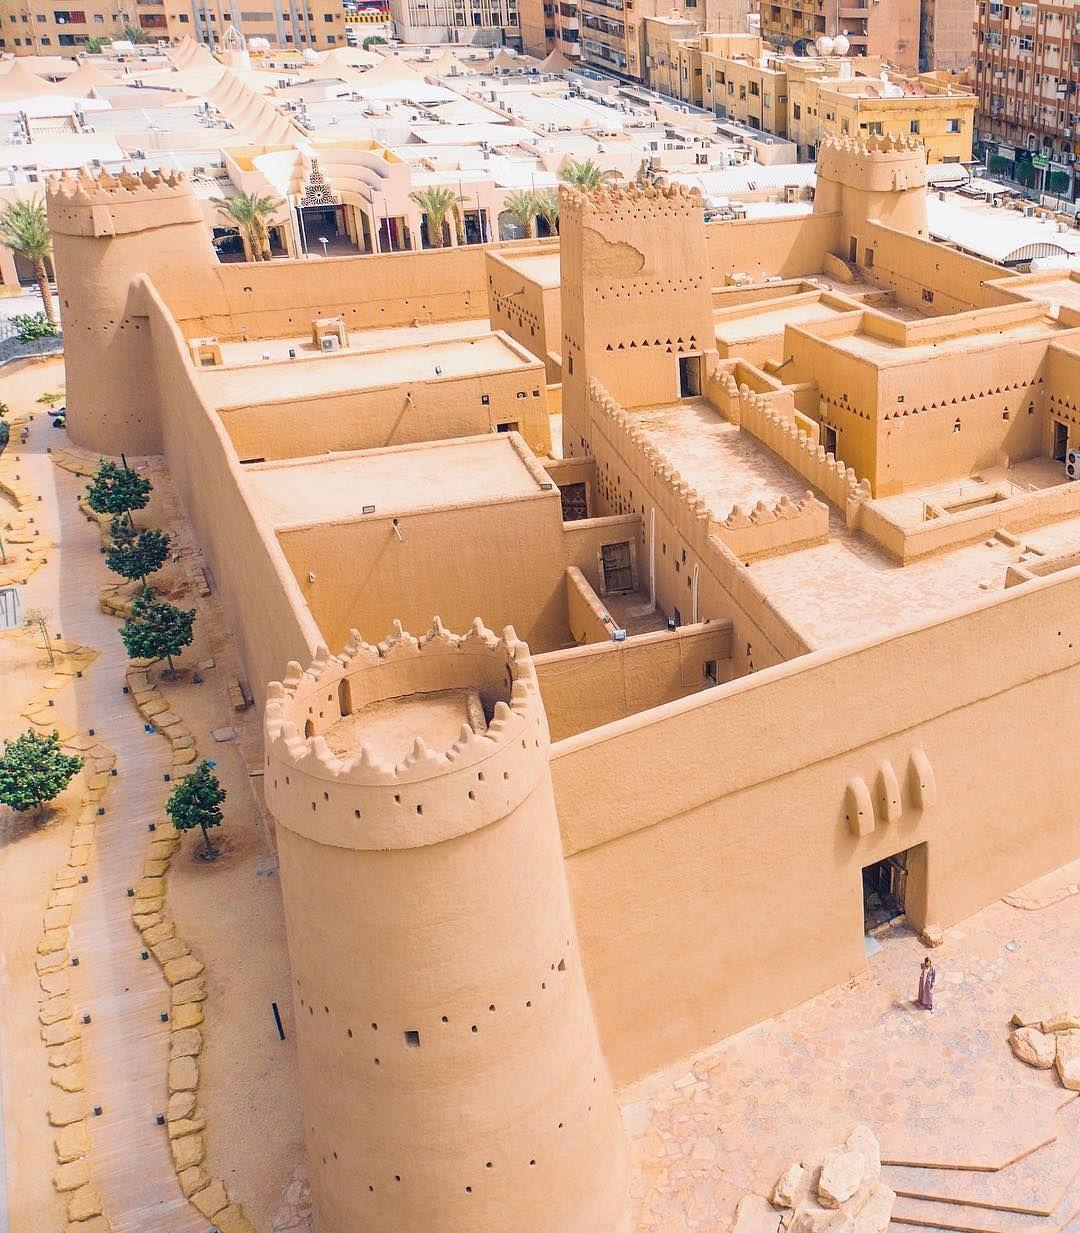 The Masmak Fort Riyadh City Visitsaudi Saudiarabia Riyadh Masmak Sauditourism History Explore Riyadh World Heritage Sites Places To Visit